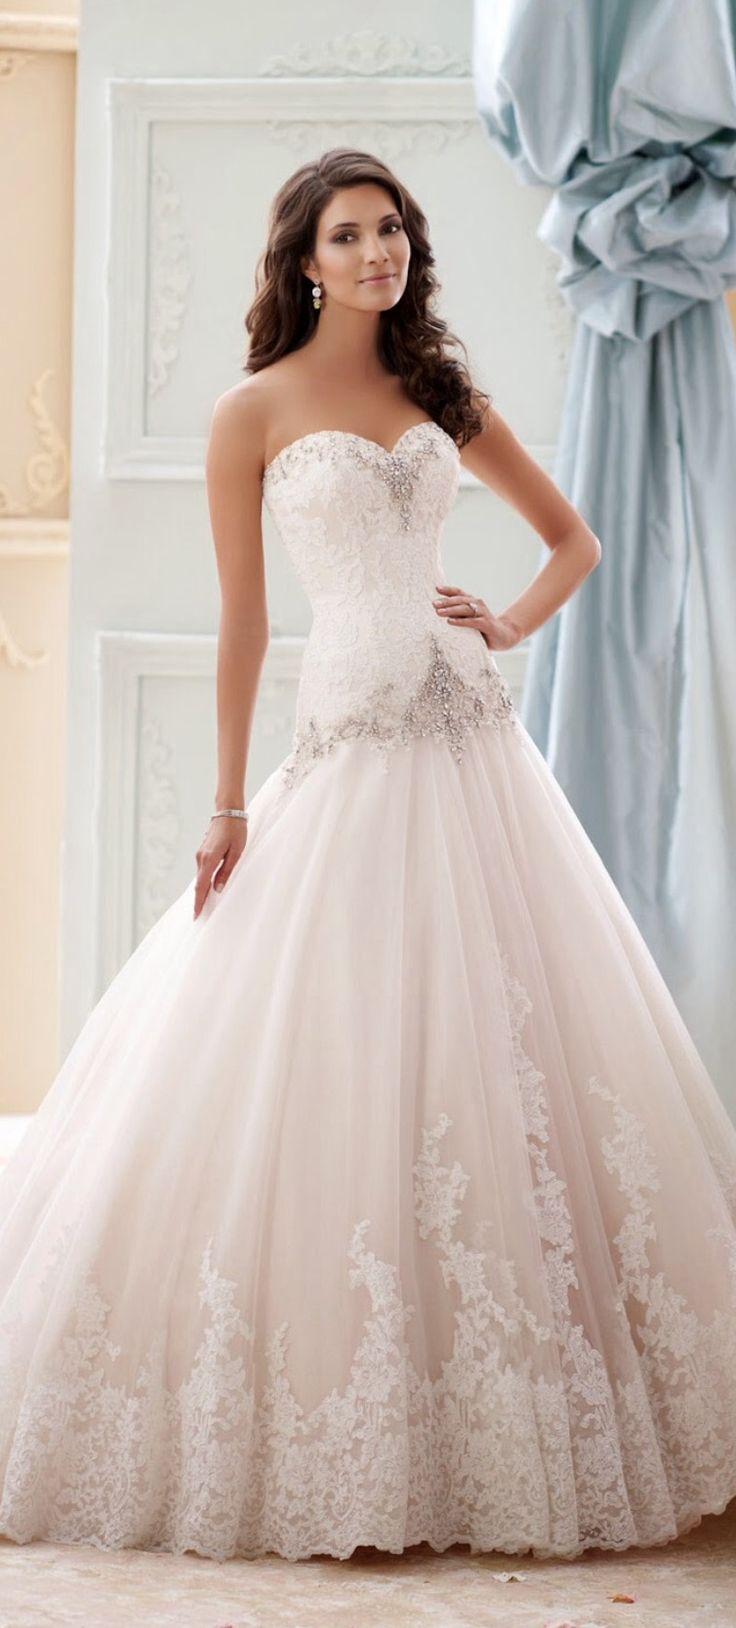 25+ best ideas about Ugly wedding dress on Pinterest   Weeding ...